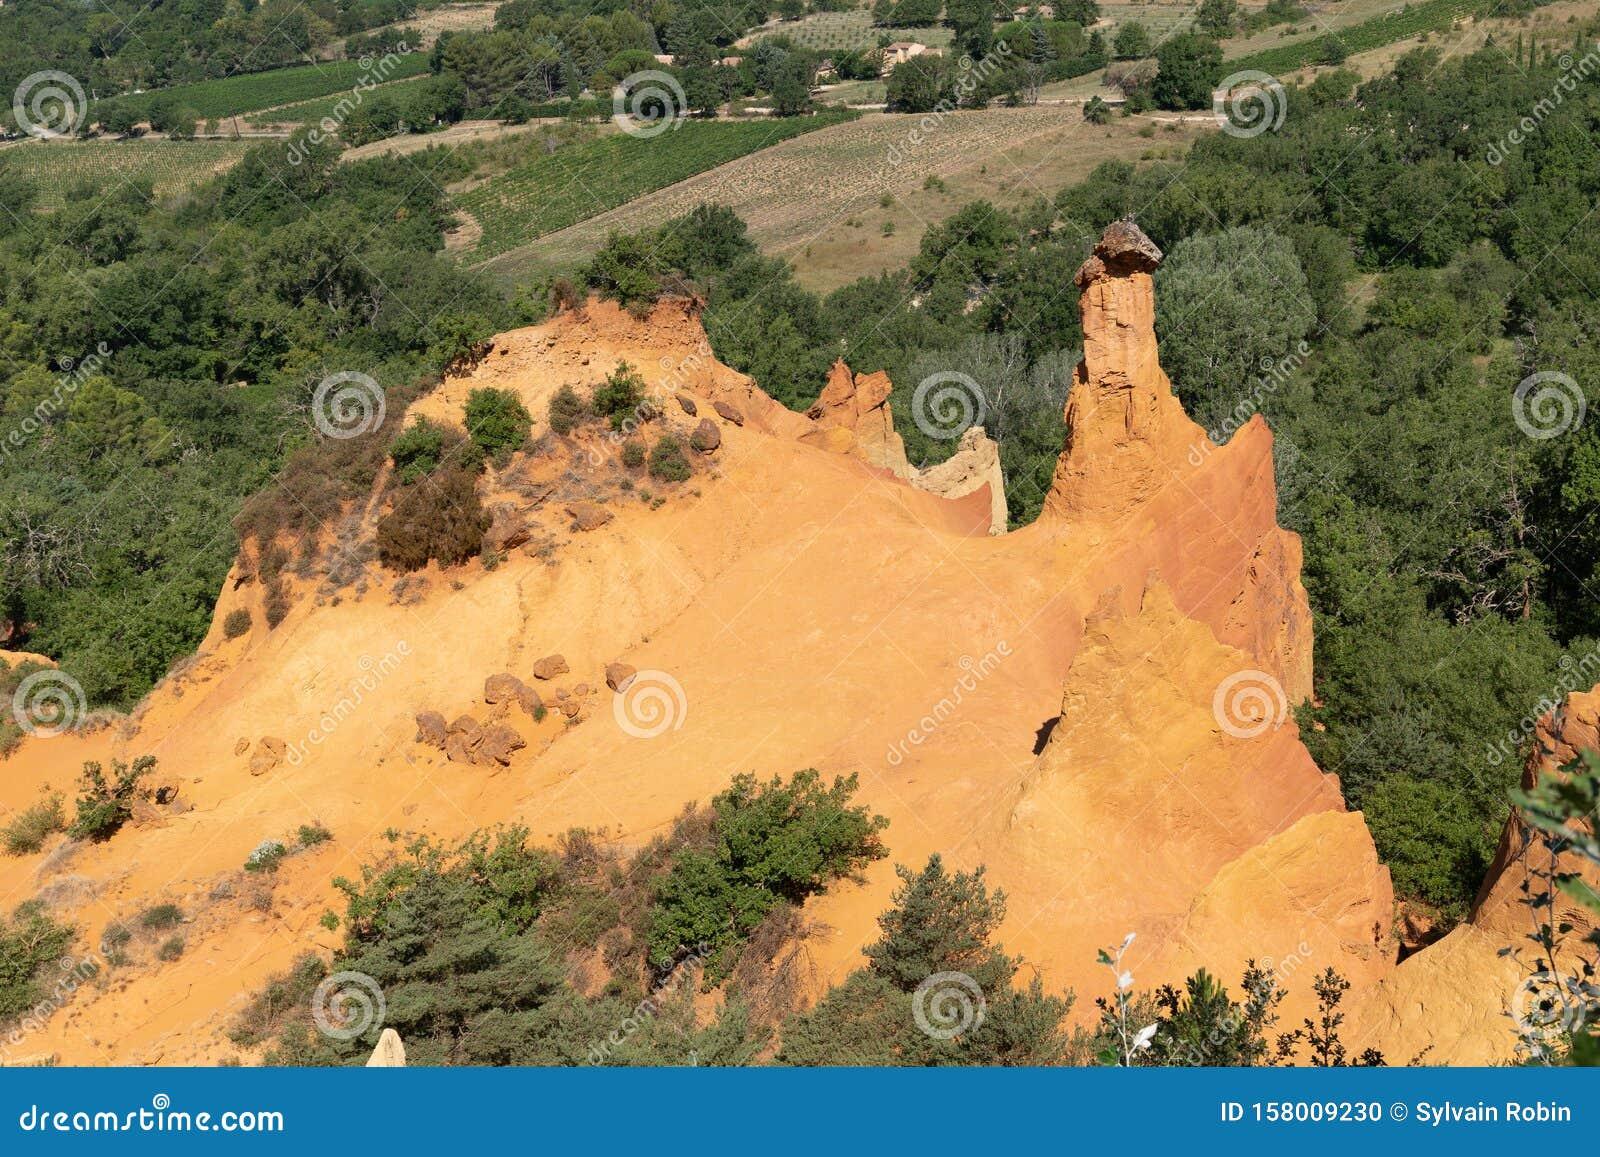 Colorado Provencal In Provence France Red Rocks Landscape In Roussillon Rustrel Village Stock Photo Image Of Erosion Luberon 158009230